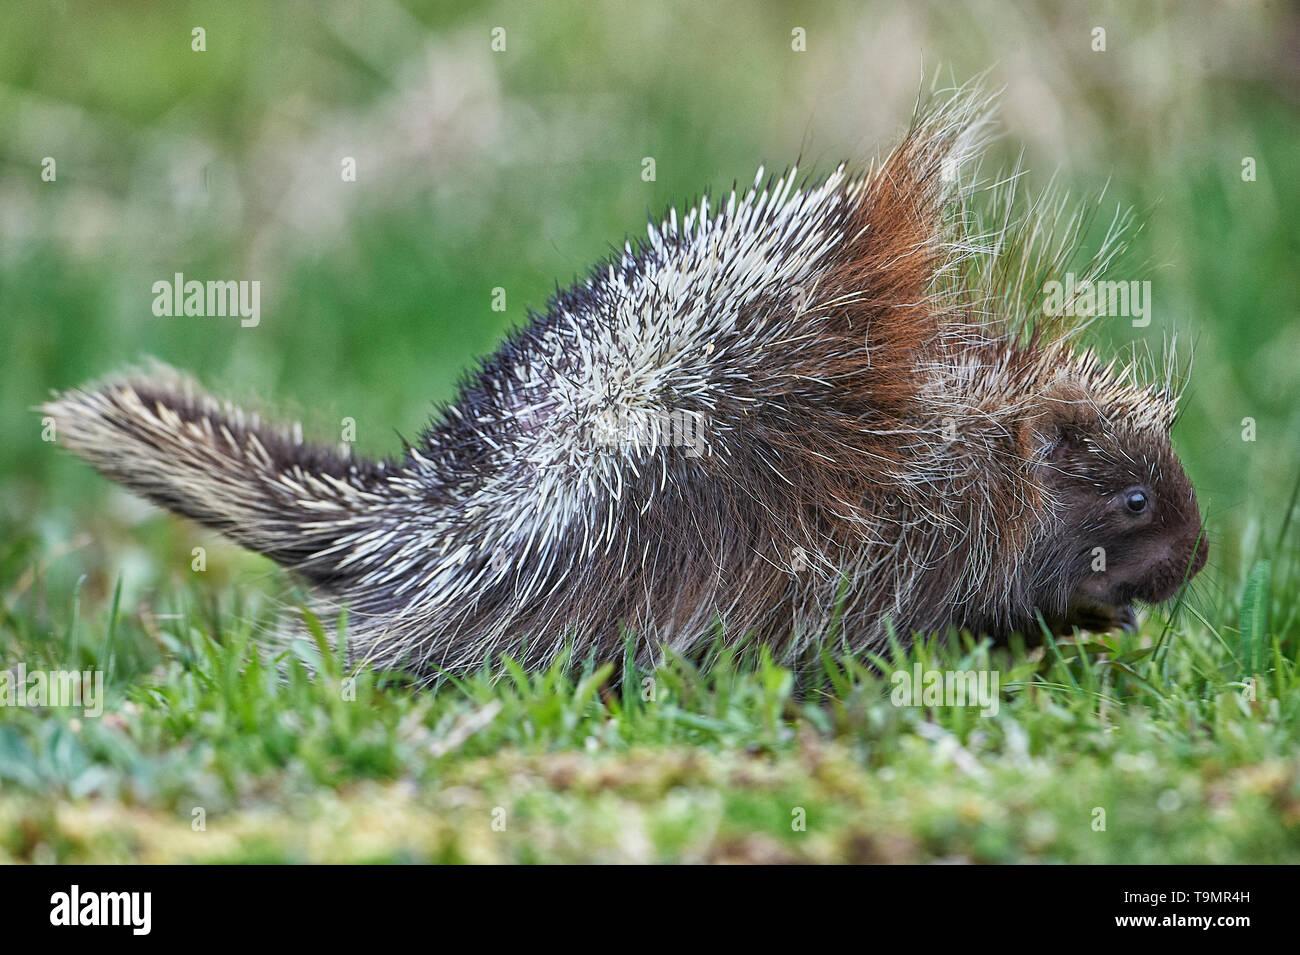 A young porcupine, (Erethizon dorsatum), Upper Clements, Annapolis Royal, Nova Scotia, Canada Stock Photo